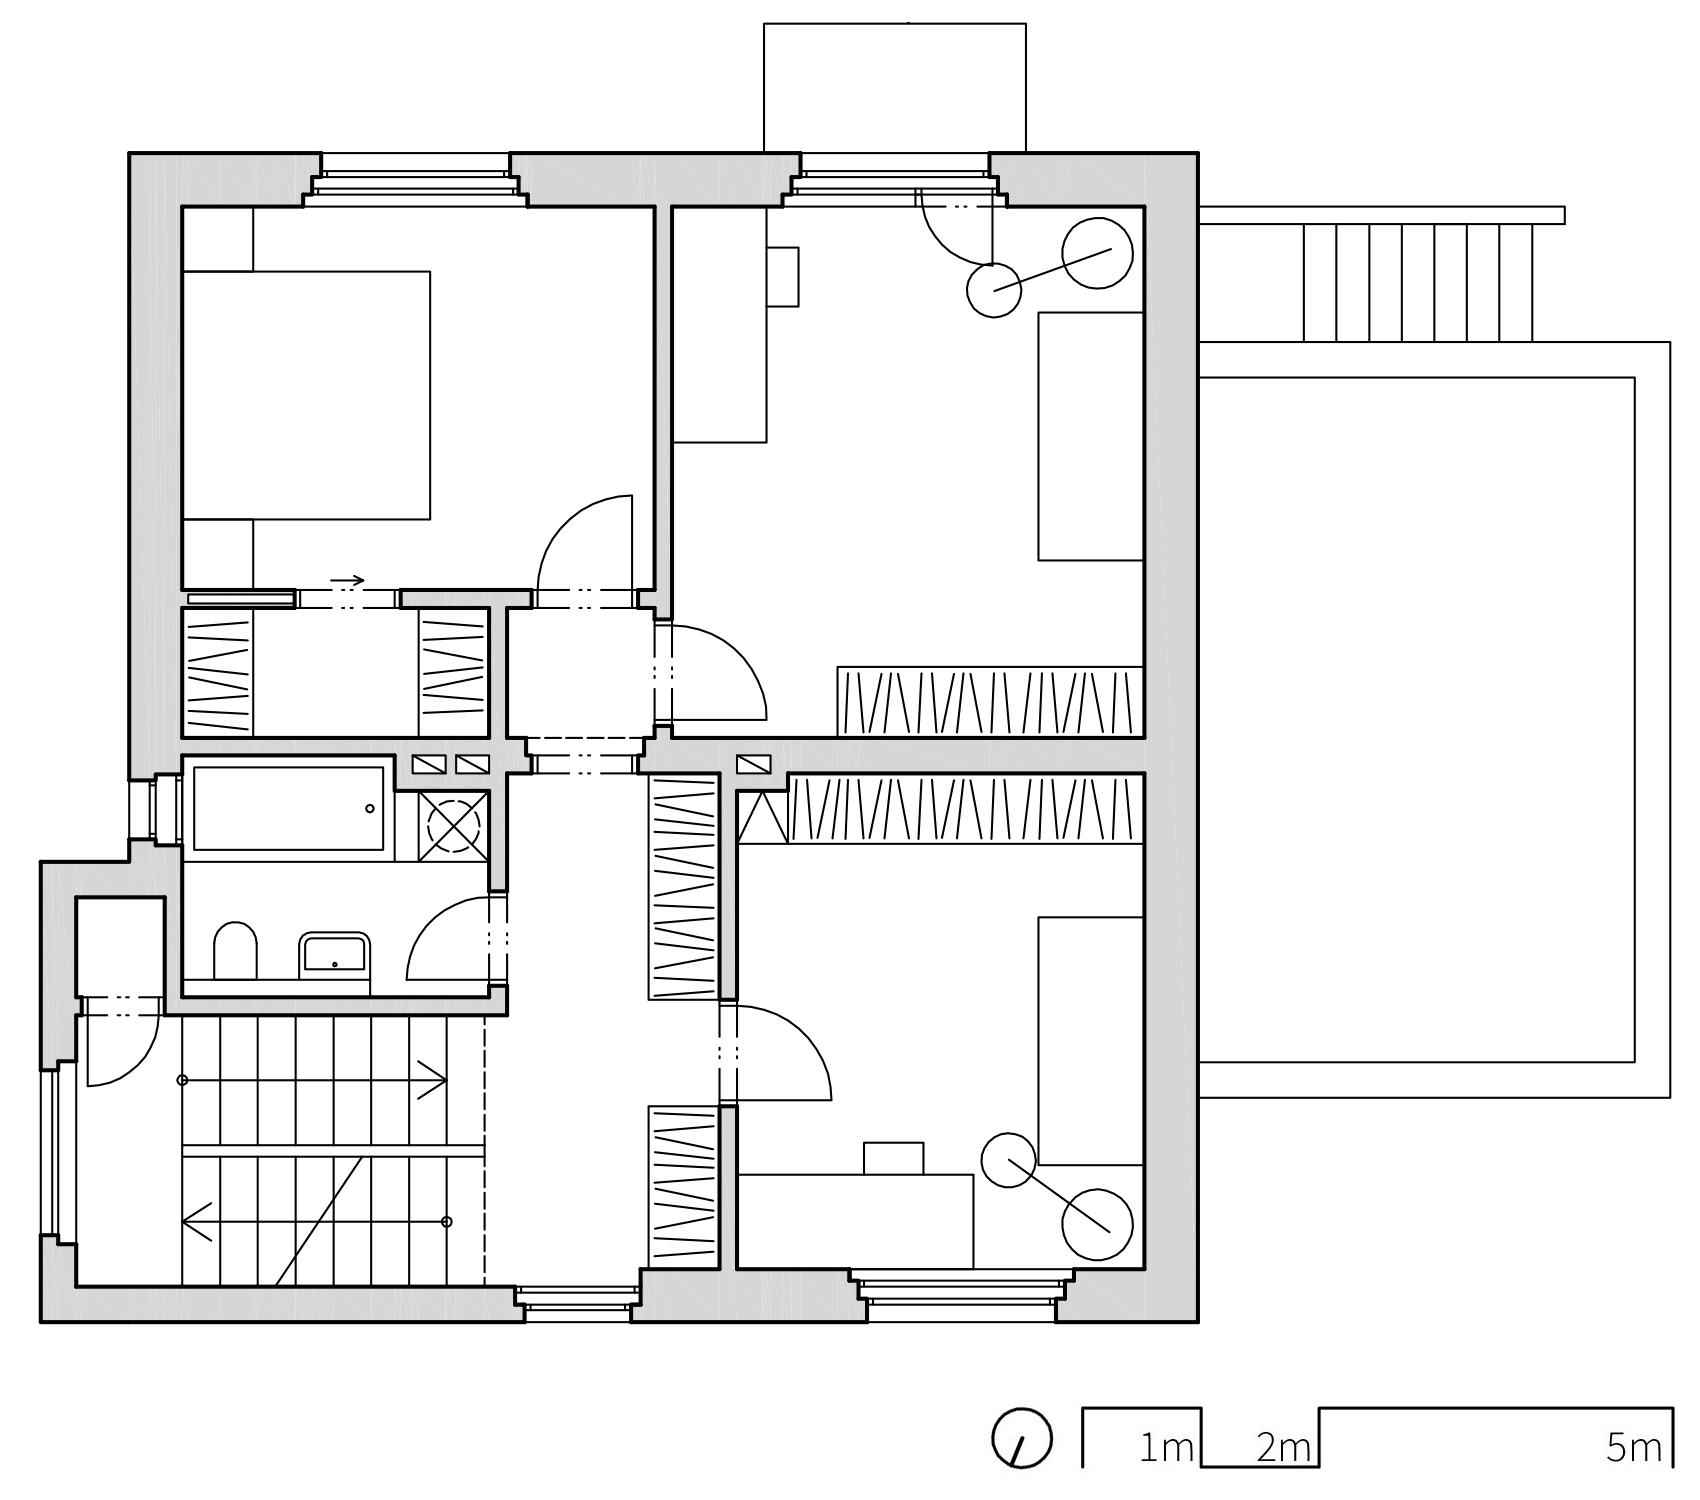 05-2NP-2560-1